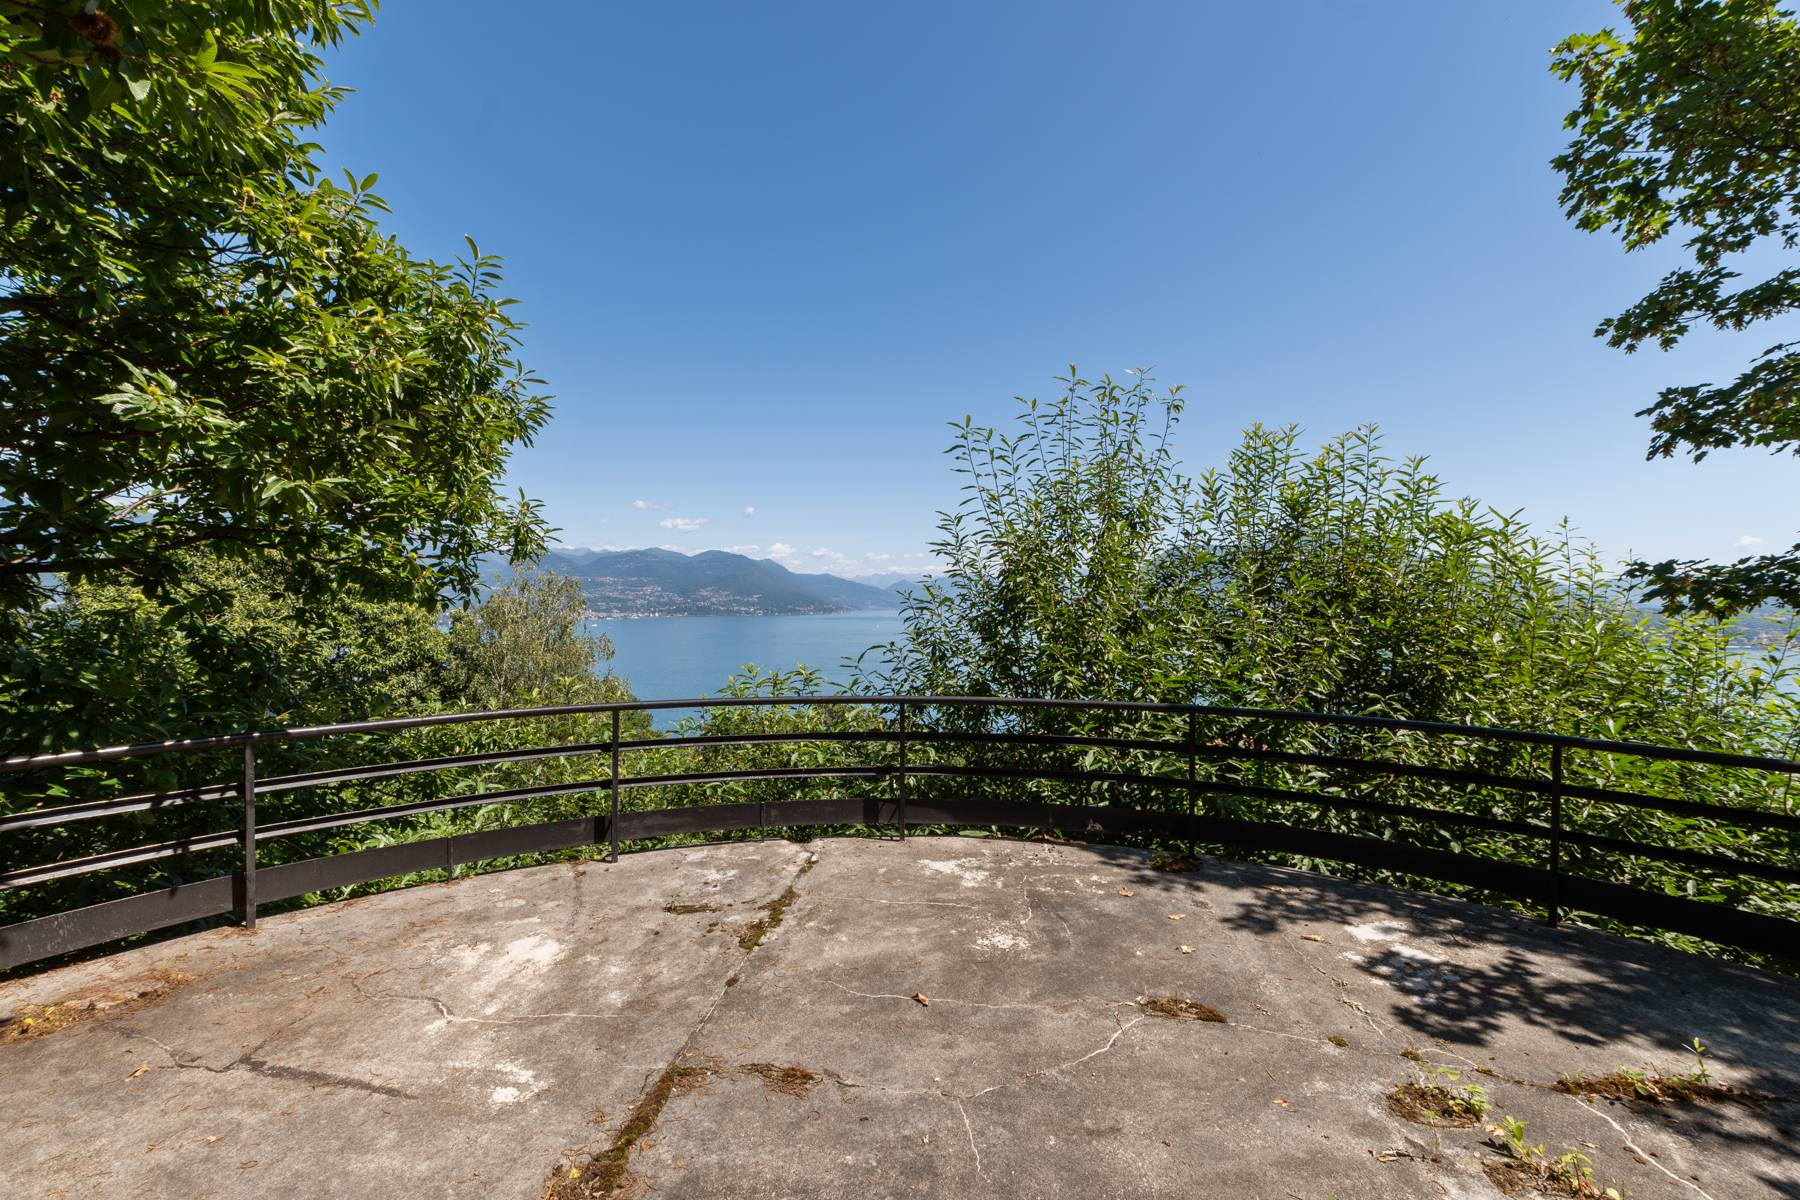 Villa in Vendita a Stresa: 5 locali, 150 mq - Foto 2